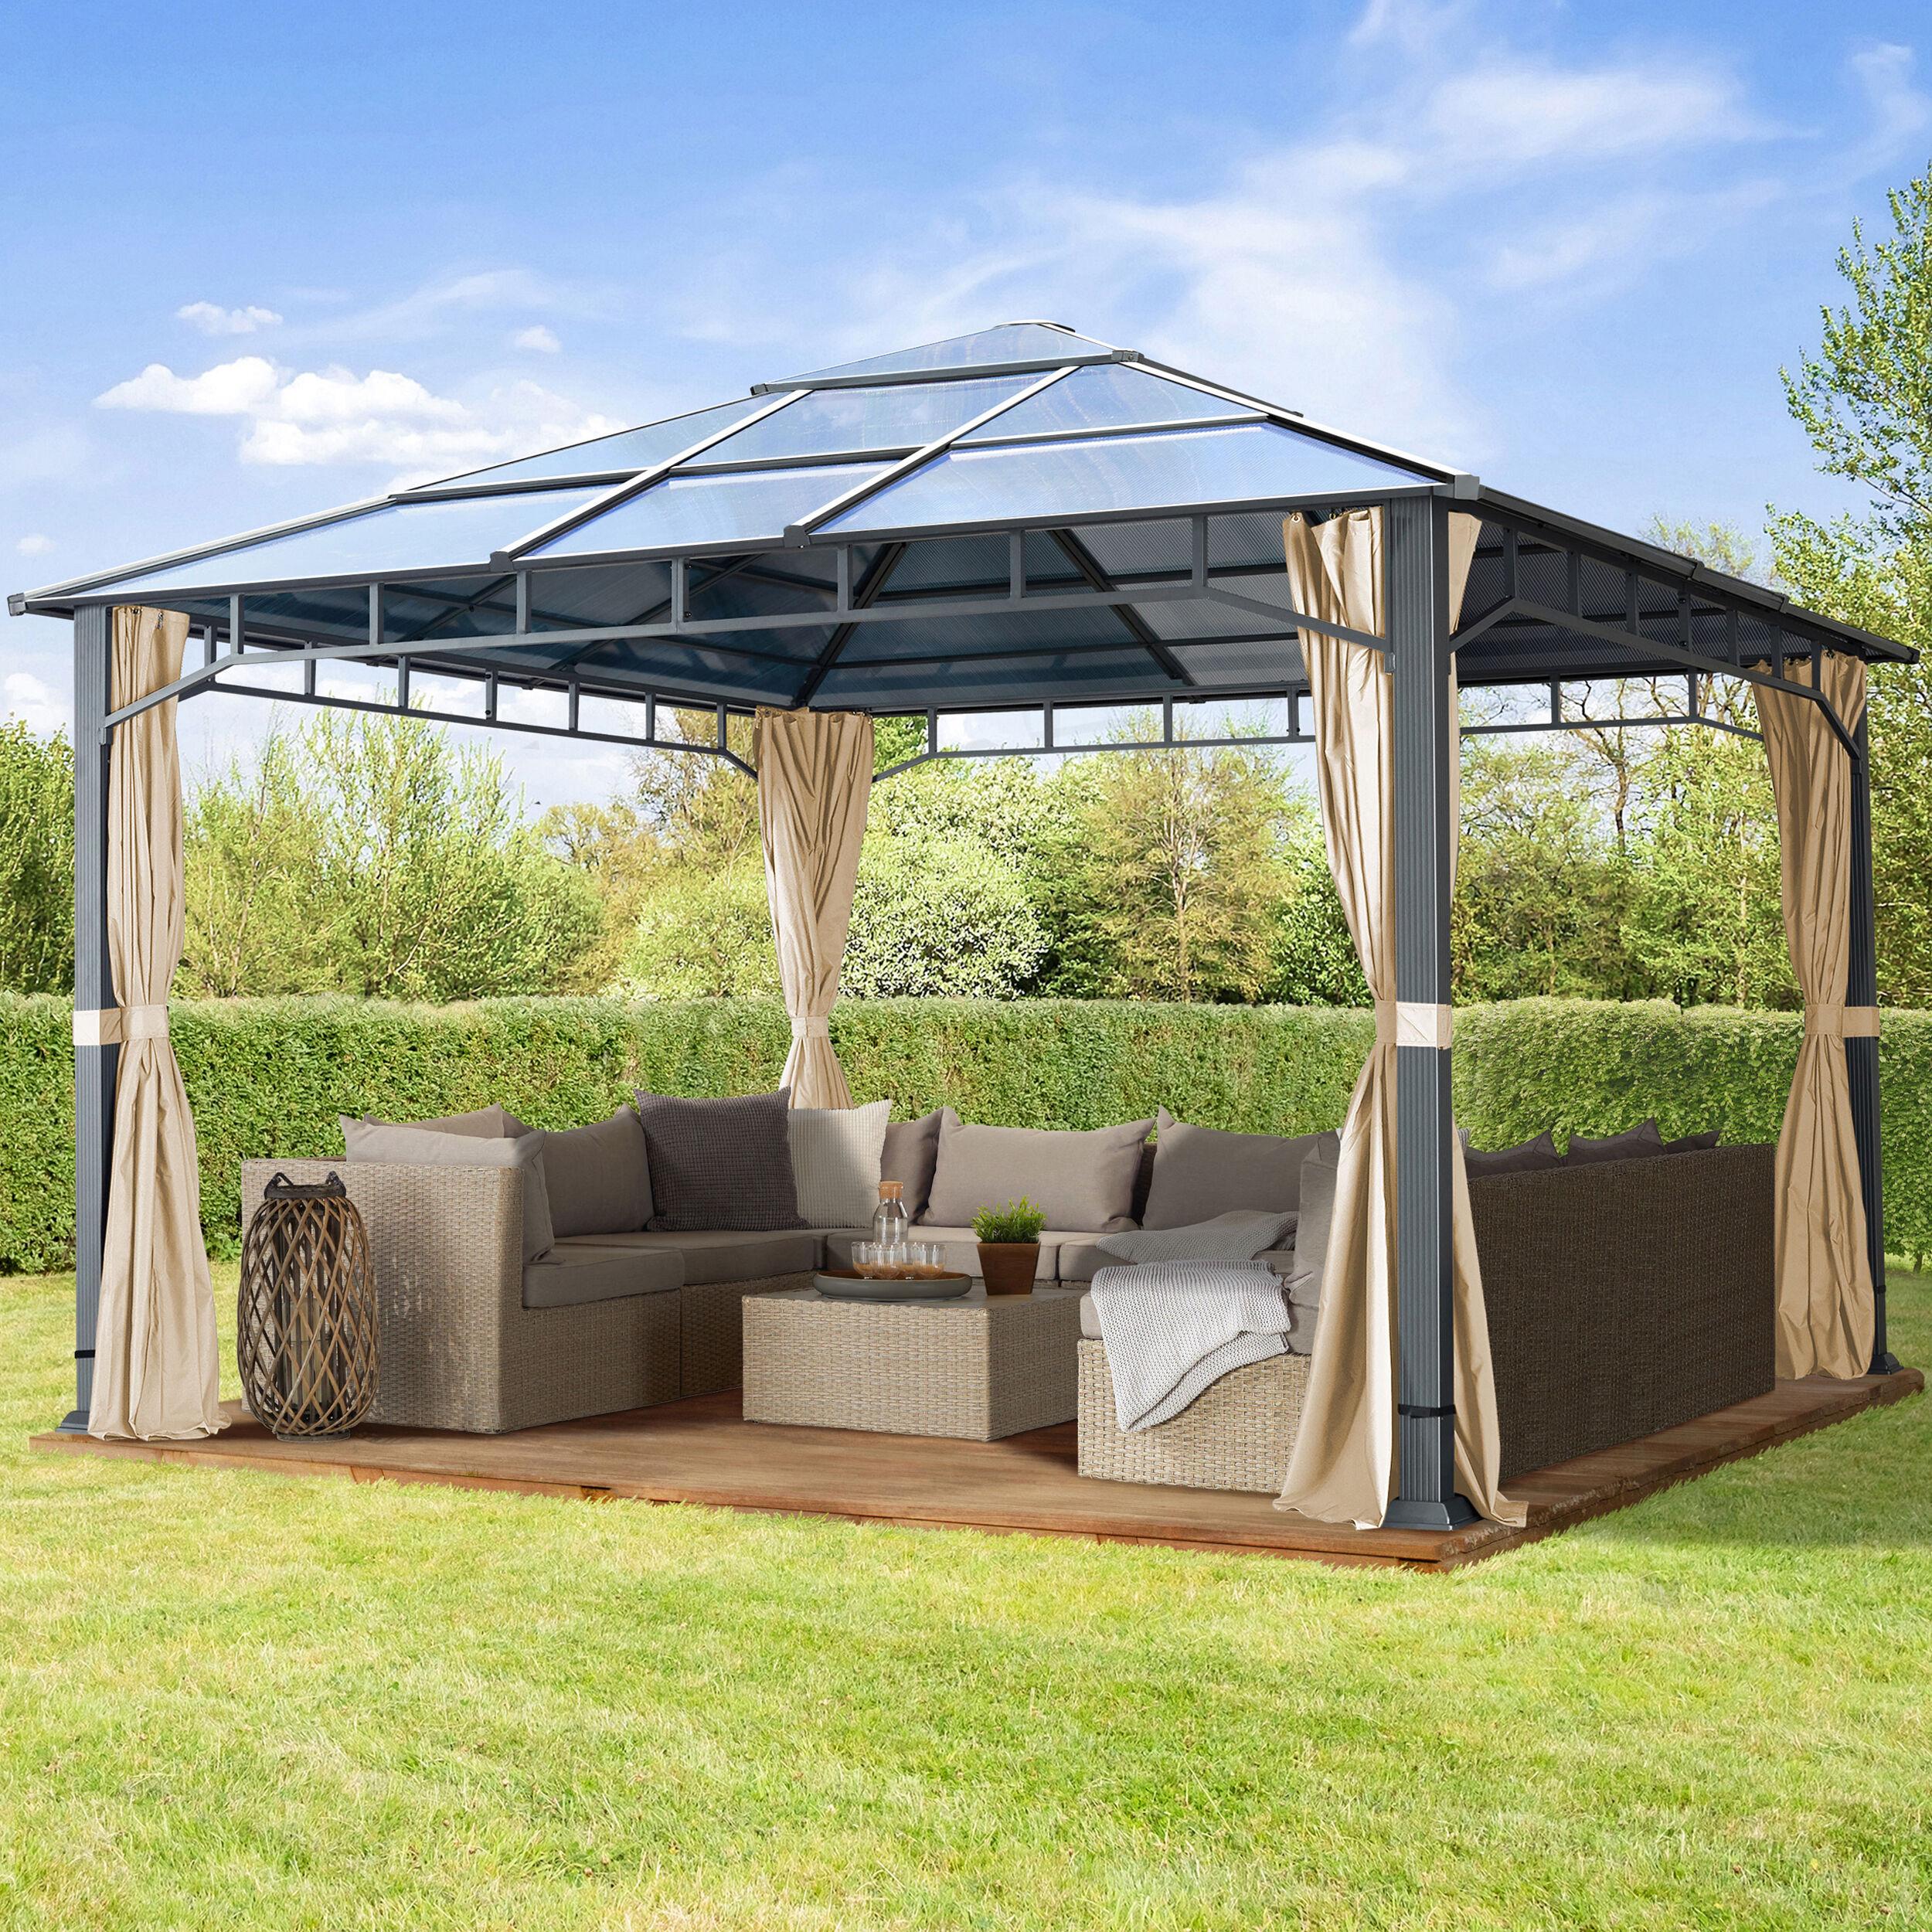 TOOLPORT Havepavillon 4x4m Polycarbonat-plader 8 mm champagnefarvet 100 % vandtæt champagnefarvet